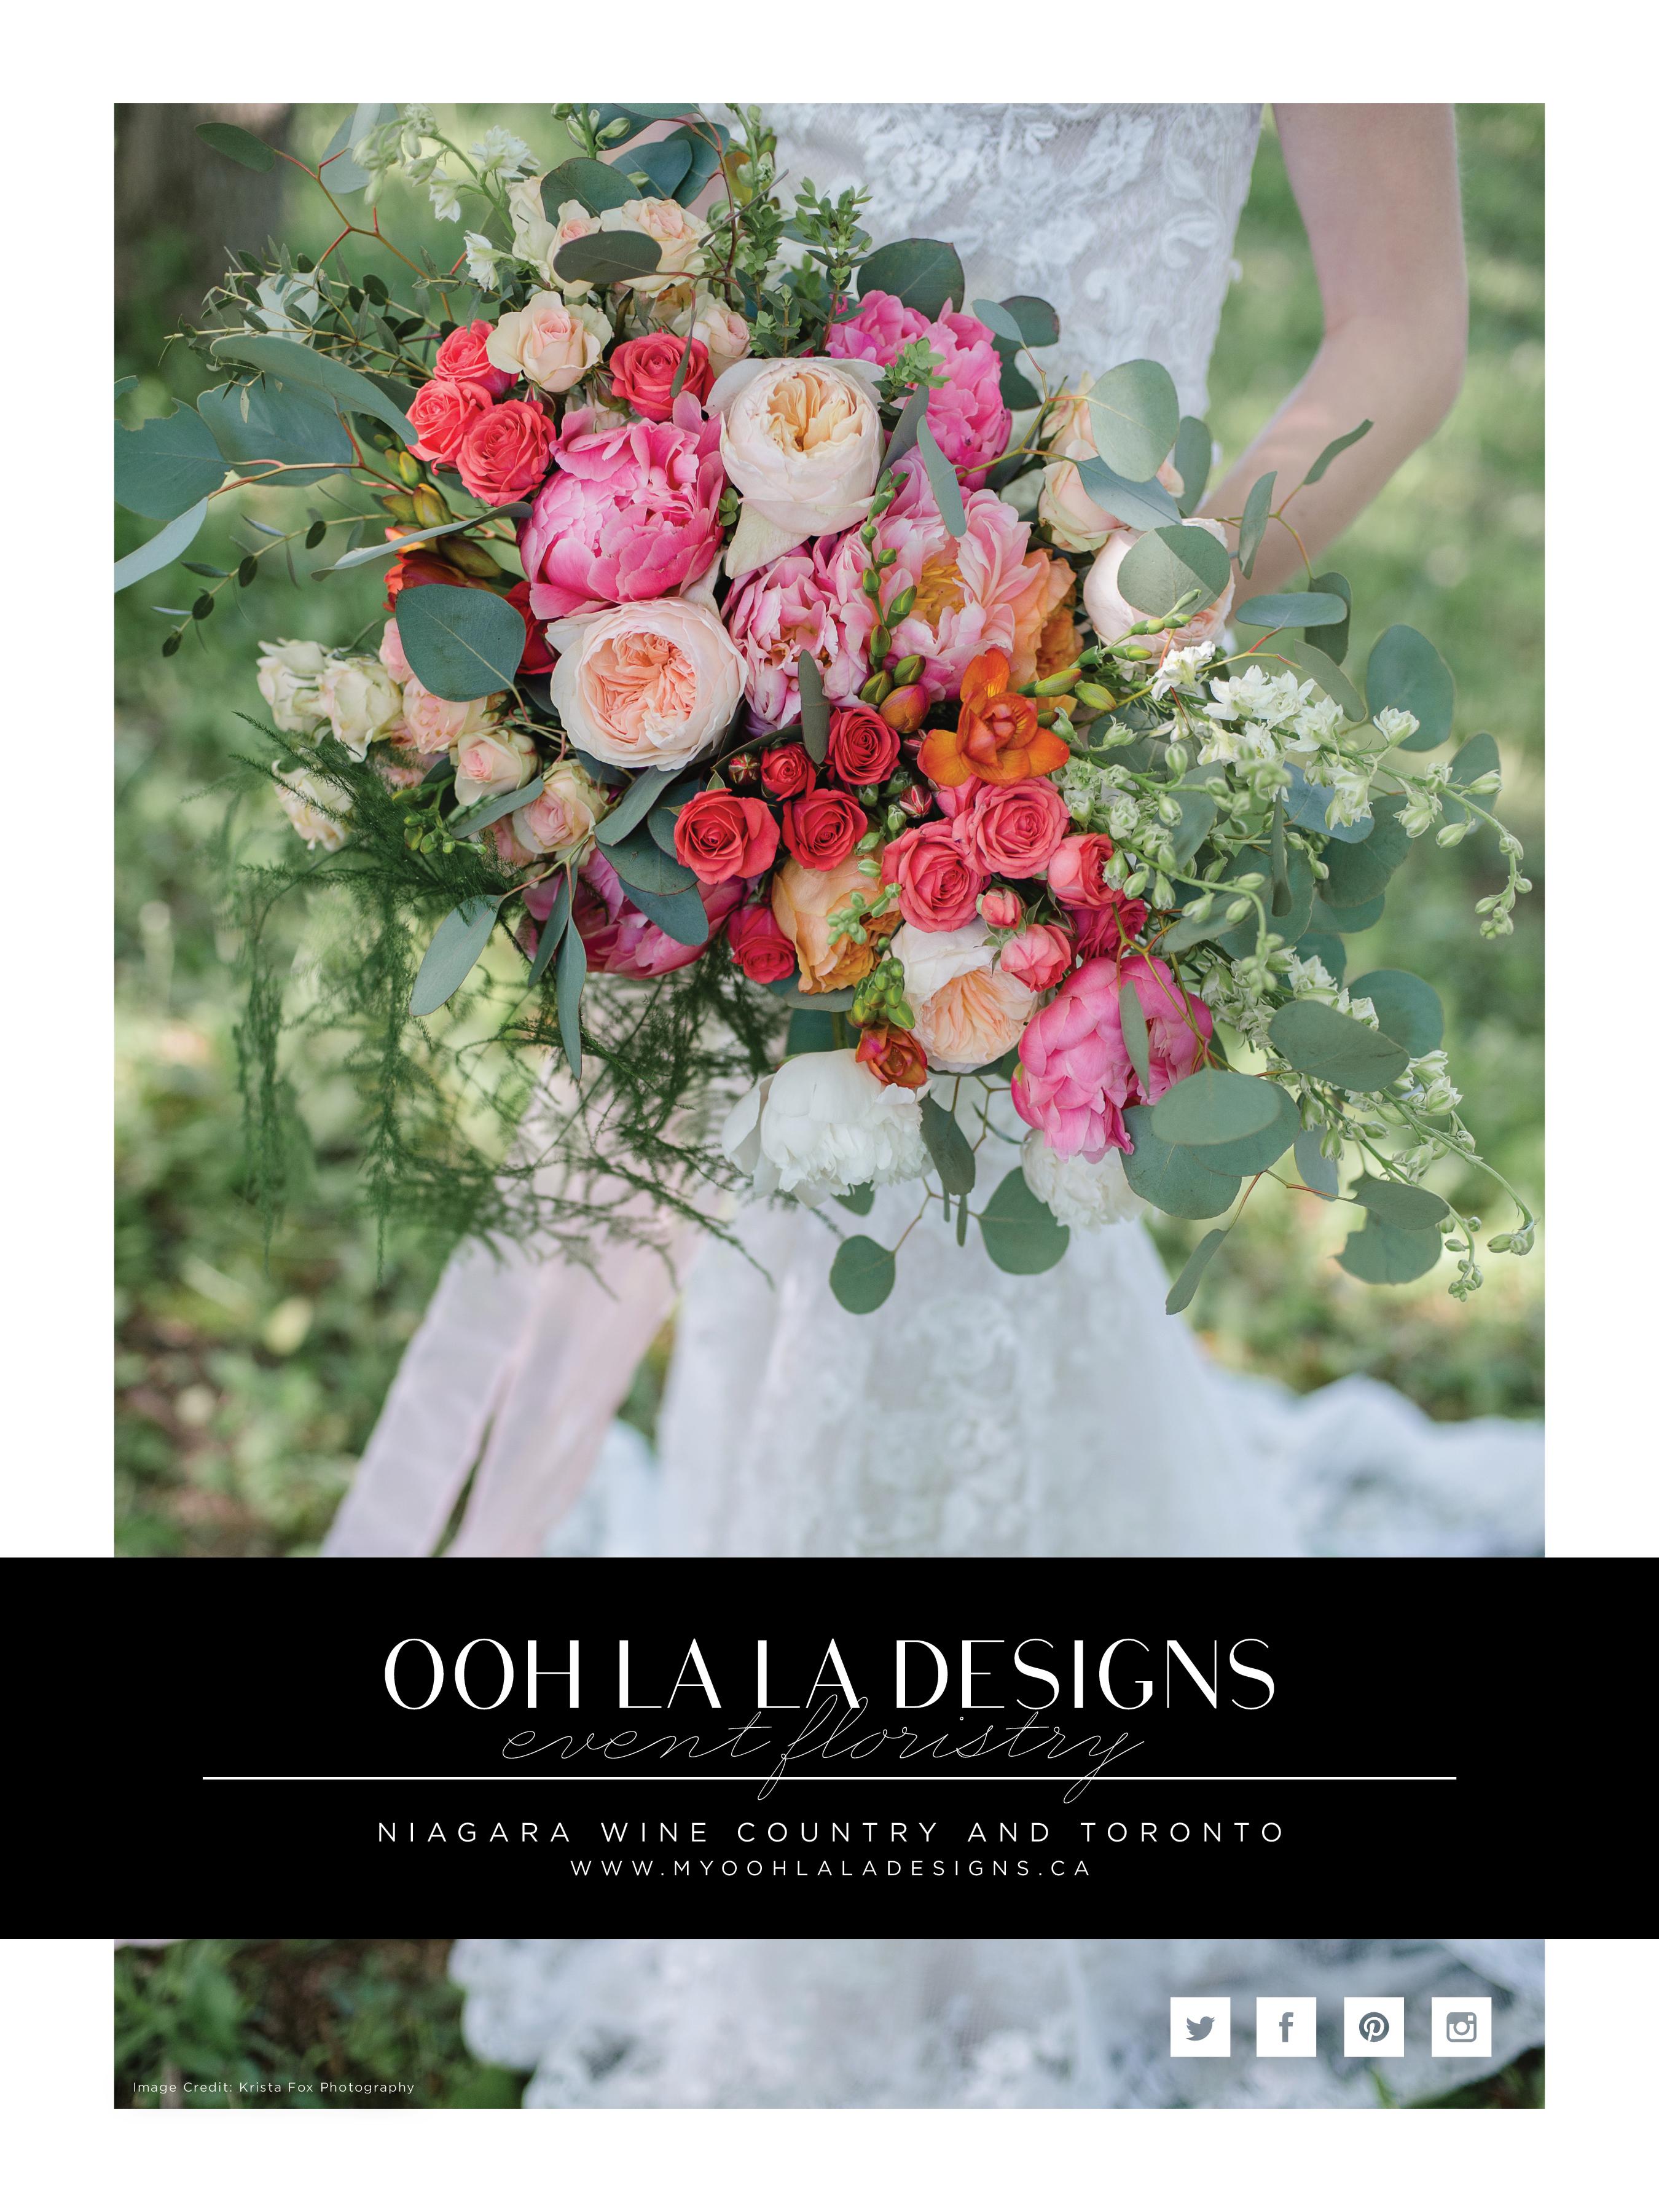 Ooh La La Designs Full Page Wedluxe Ad_Niagara Wedding Florist_Toronto Wedding Florist_Krista Fox Photography